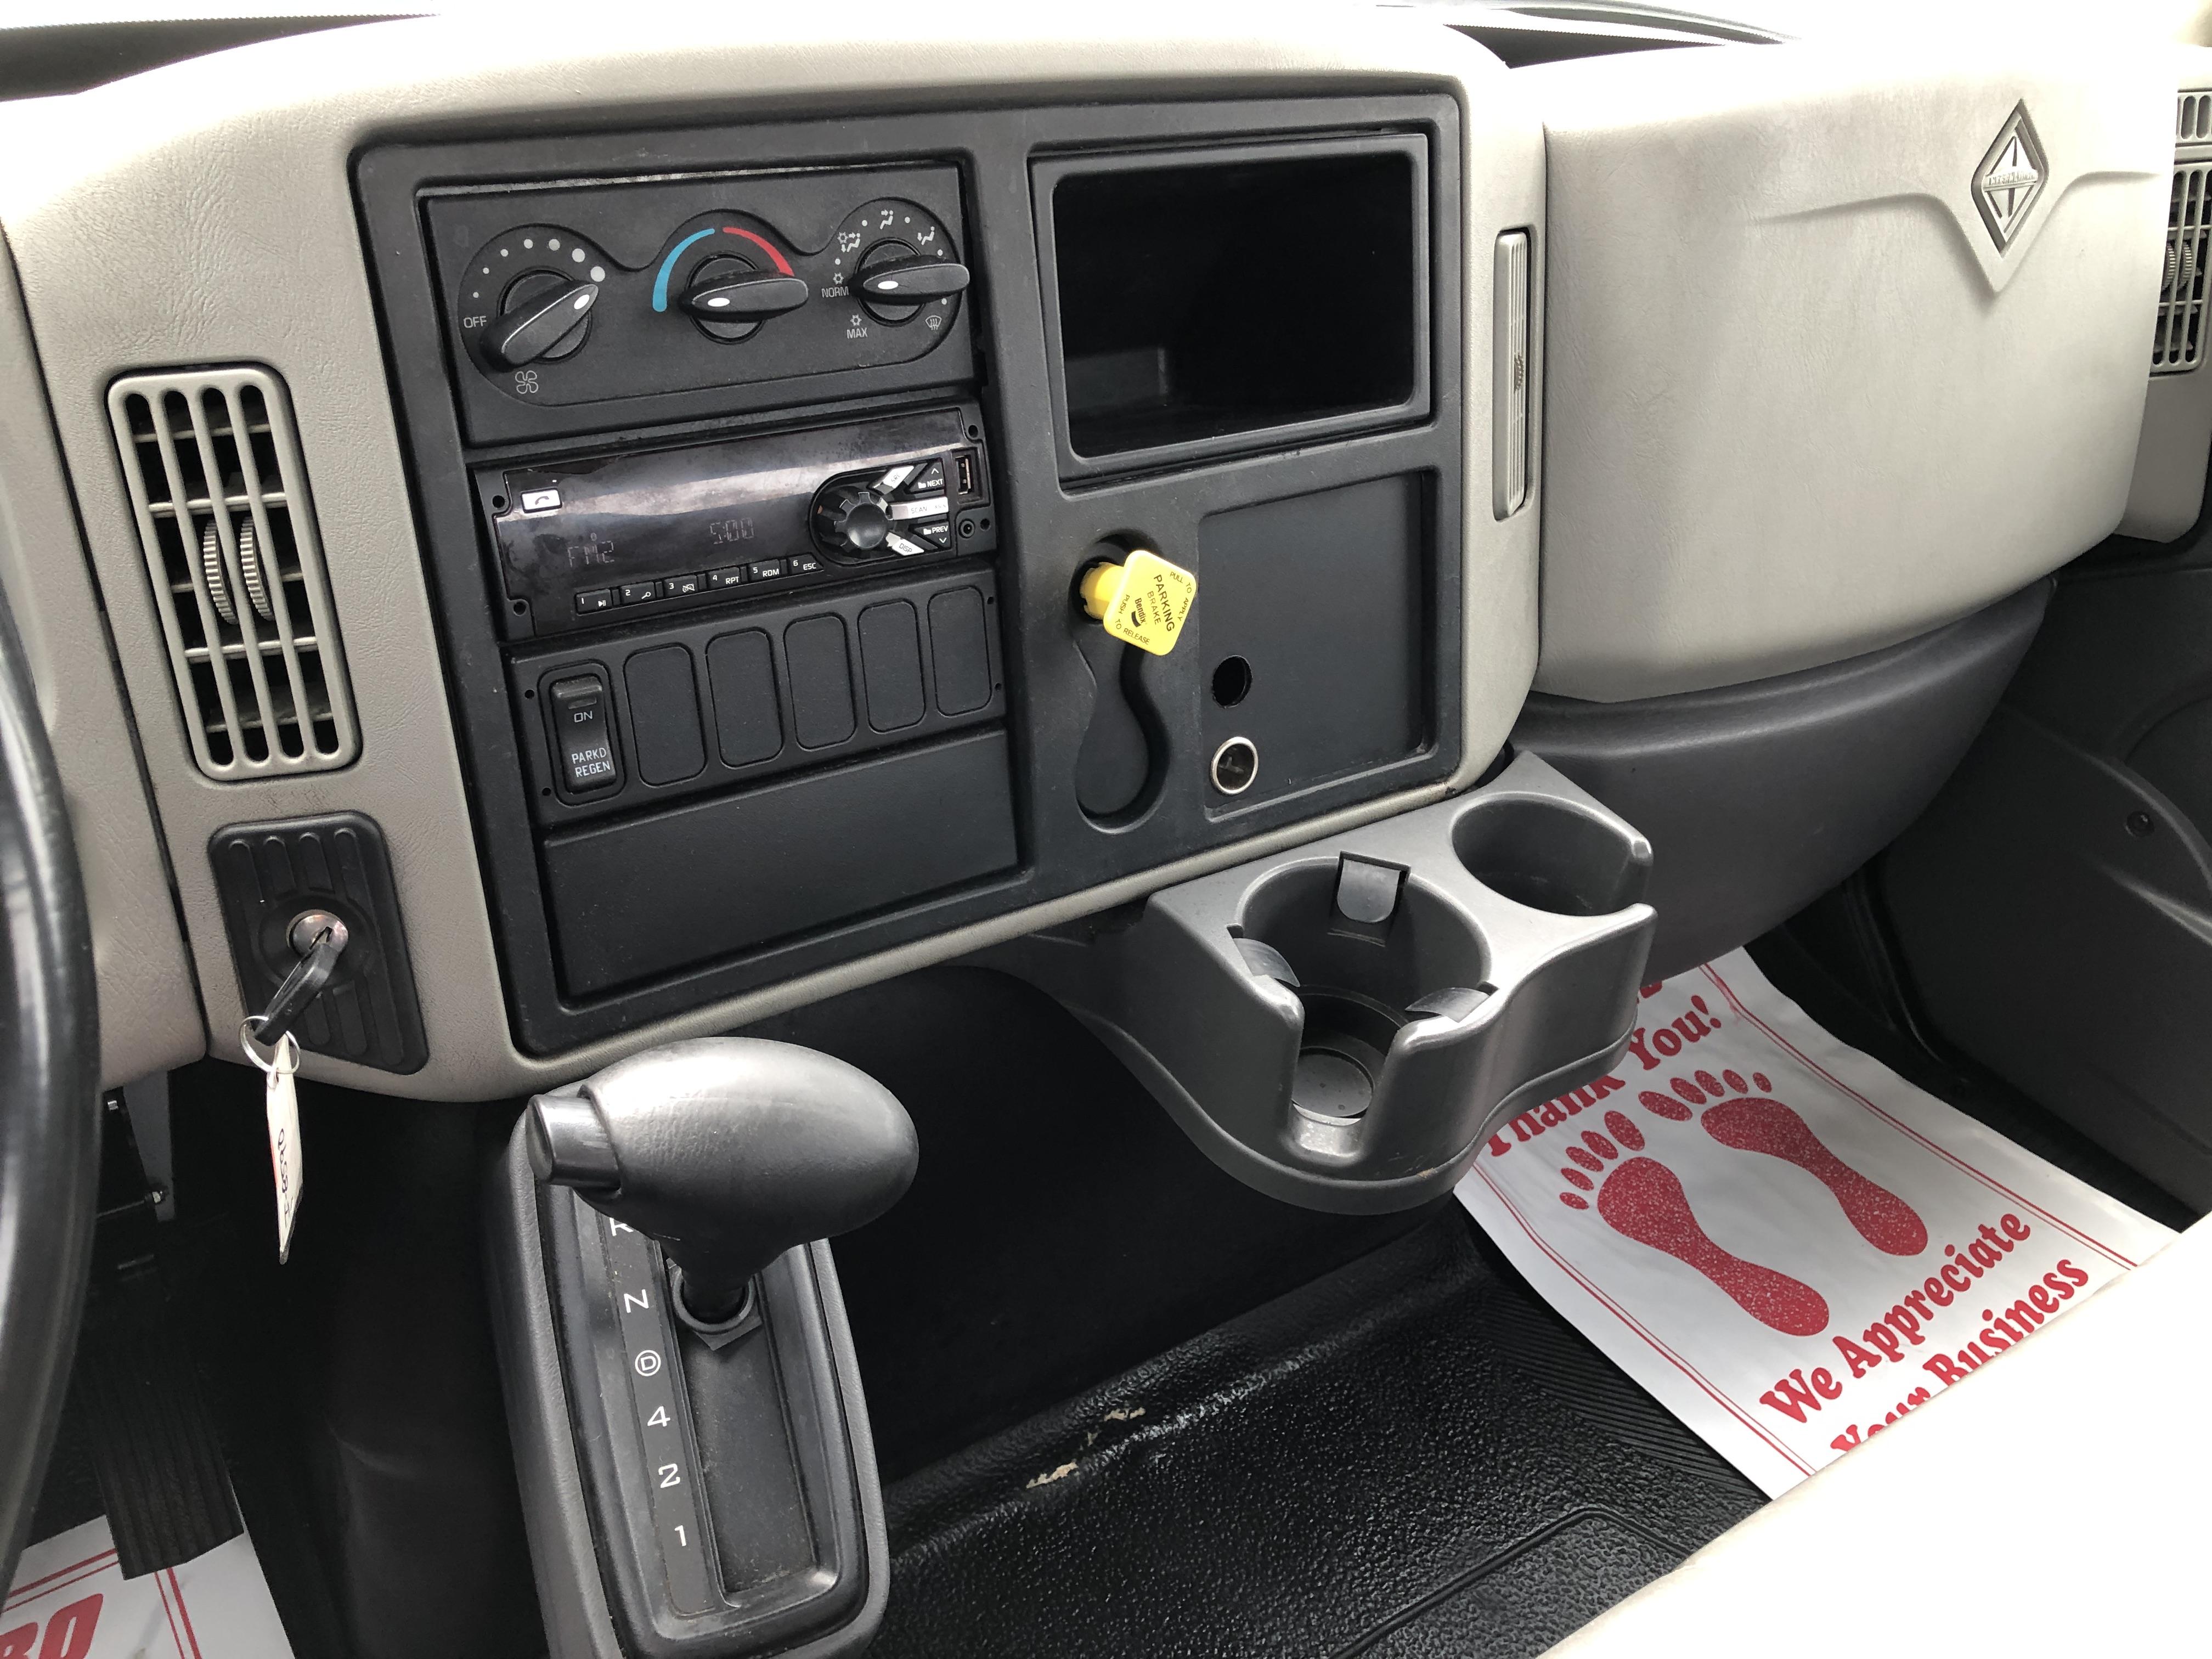 Pre-Owned 2015 INTERNATIONAL 4300